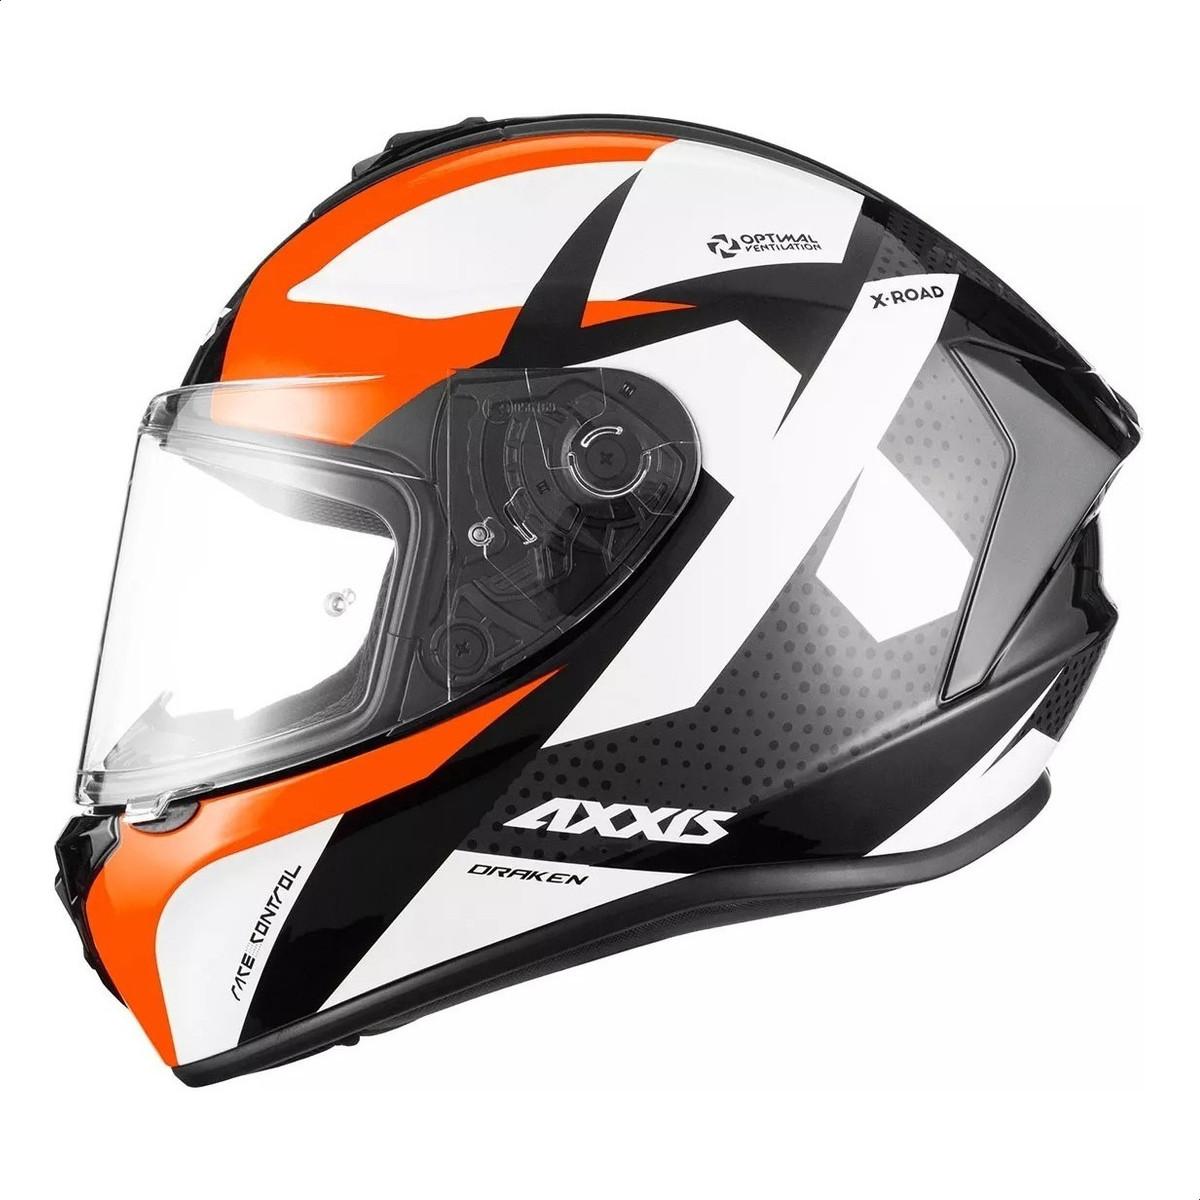 Casco Integral Axxis Draken X-Road B5 Naranja